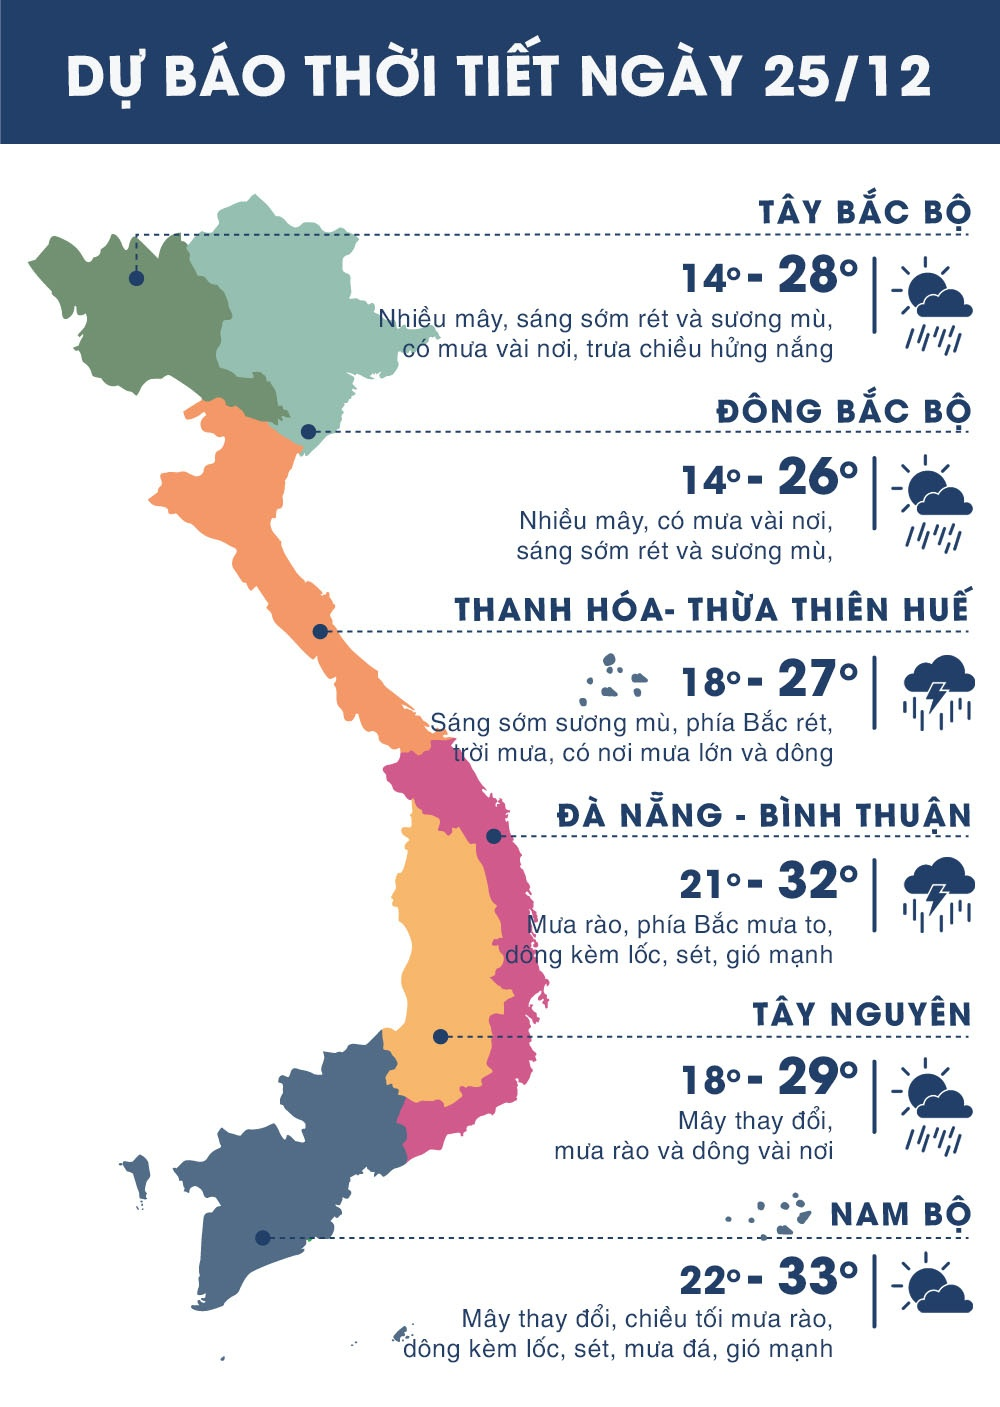 Thoi tiet ngay 25/12: Sai Gon mua dong, Ha Noi con ret 17 do C hinh anh 1